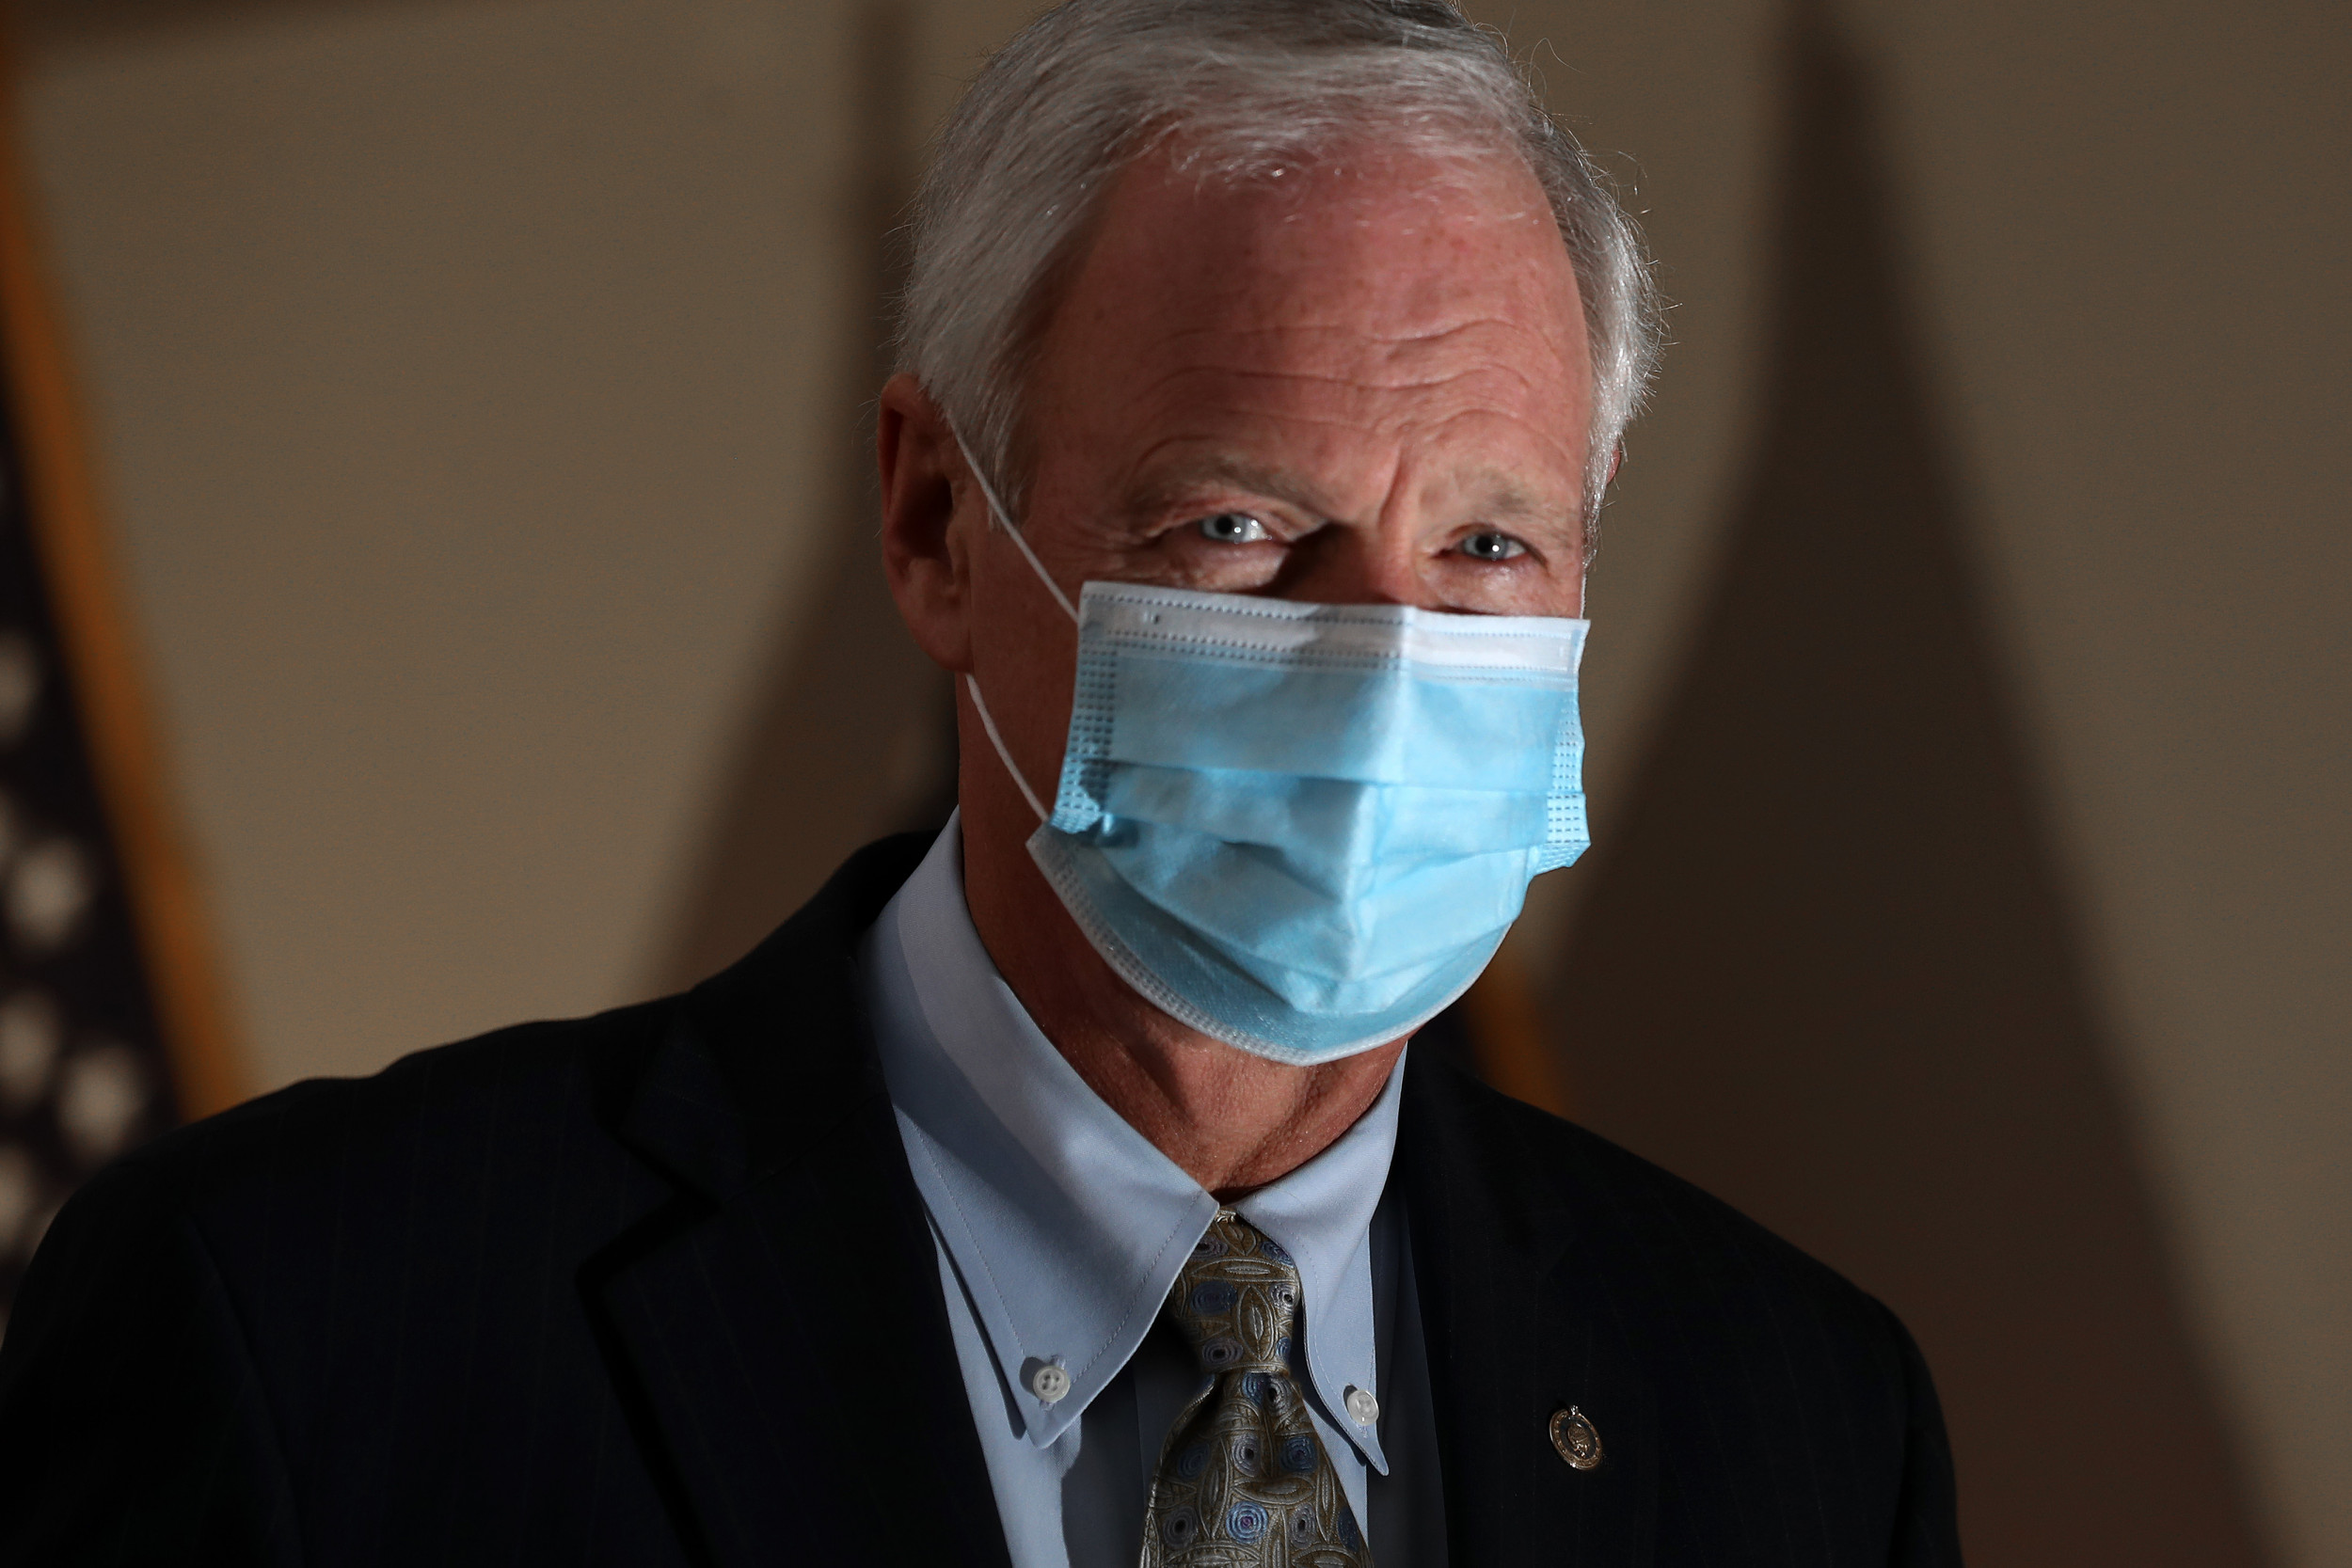 Another Republican senator in quarantine after COVID exposure